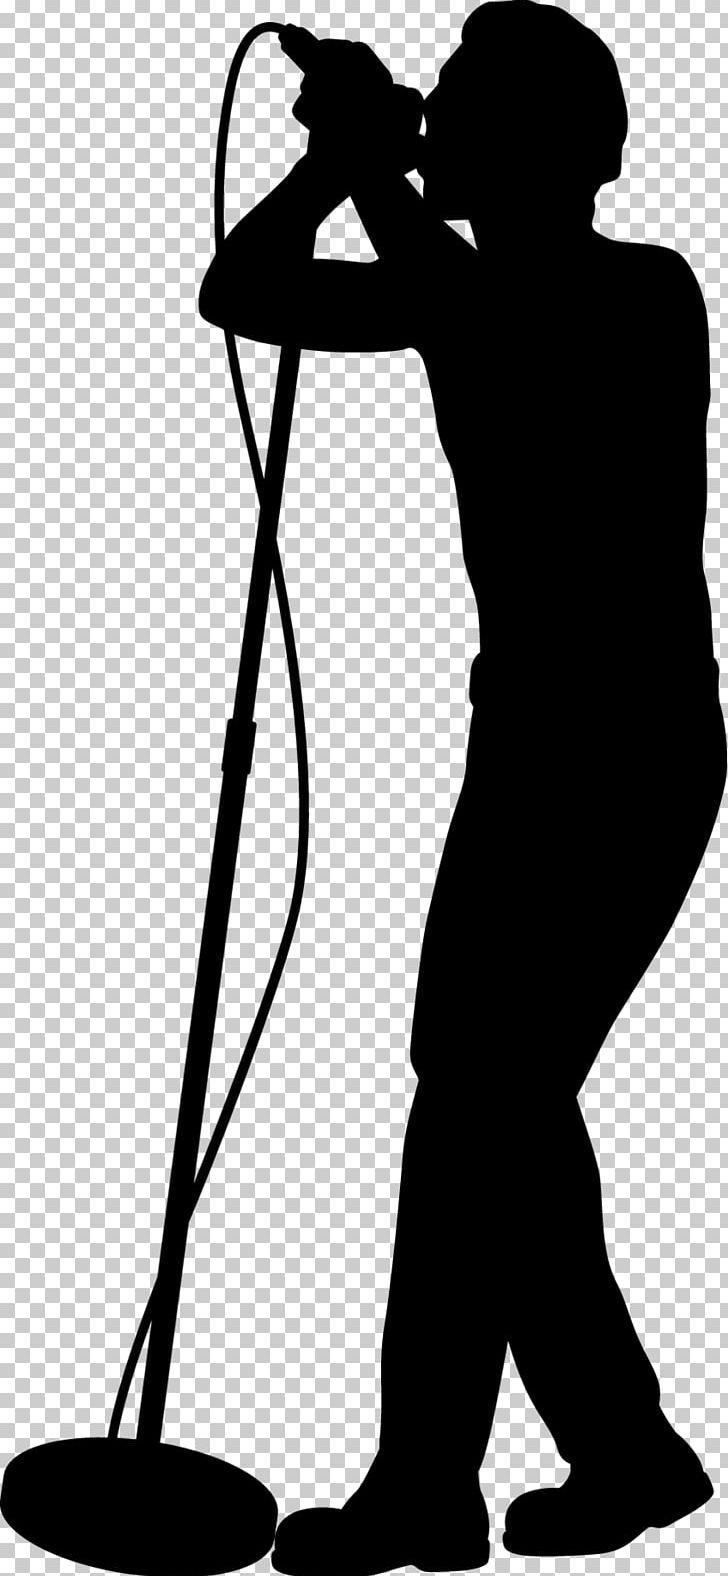 Songwriter clipart jpg transparent Silhouette Singer-songwriter Singing Female PNG, Clipart ... jpg transparent